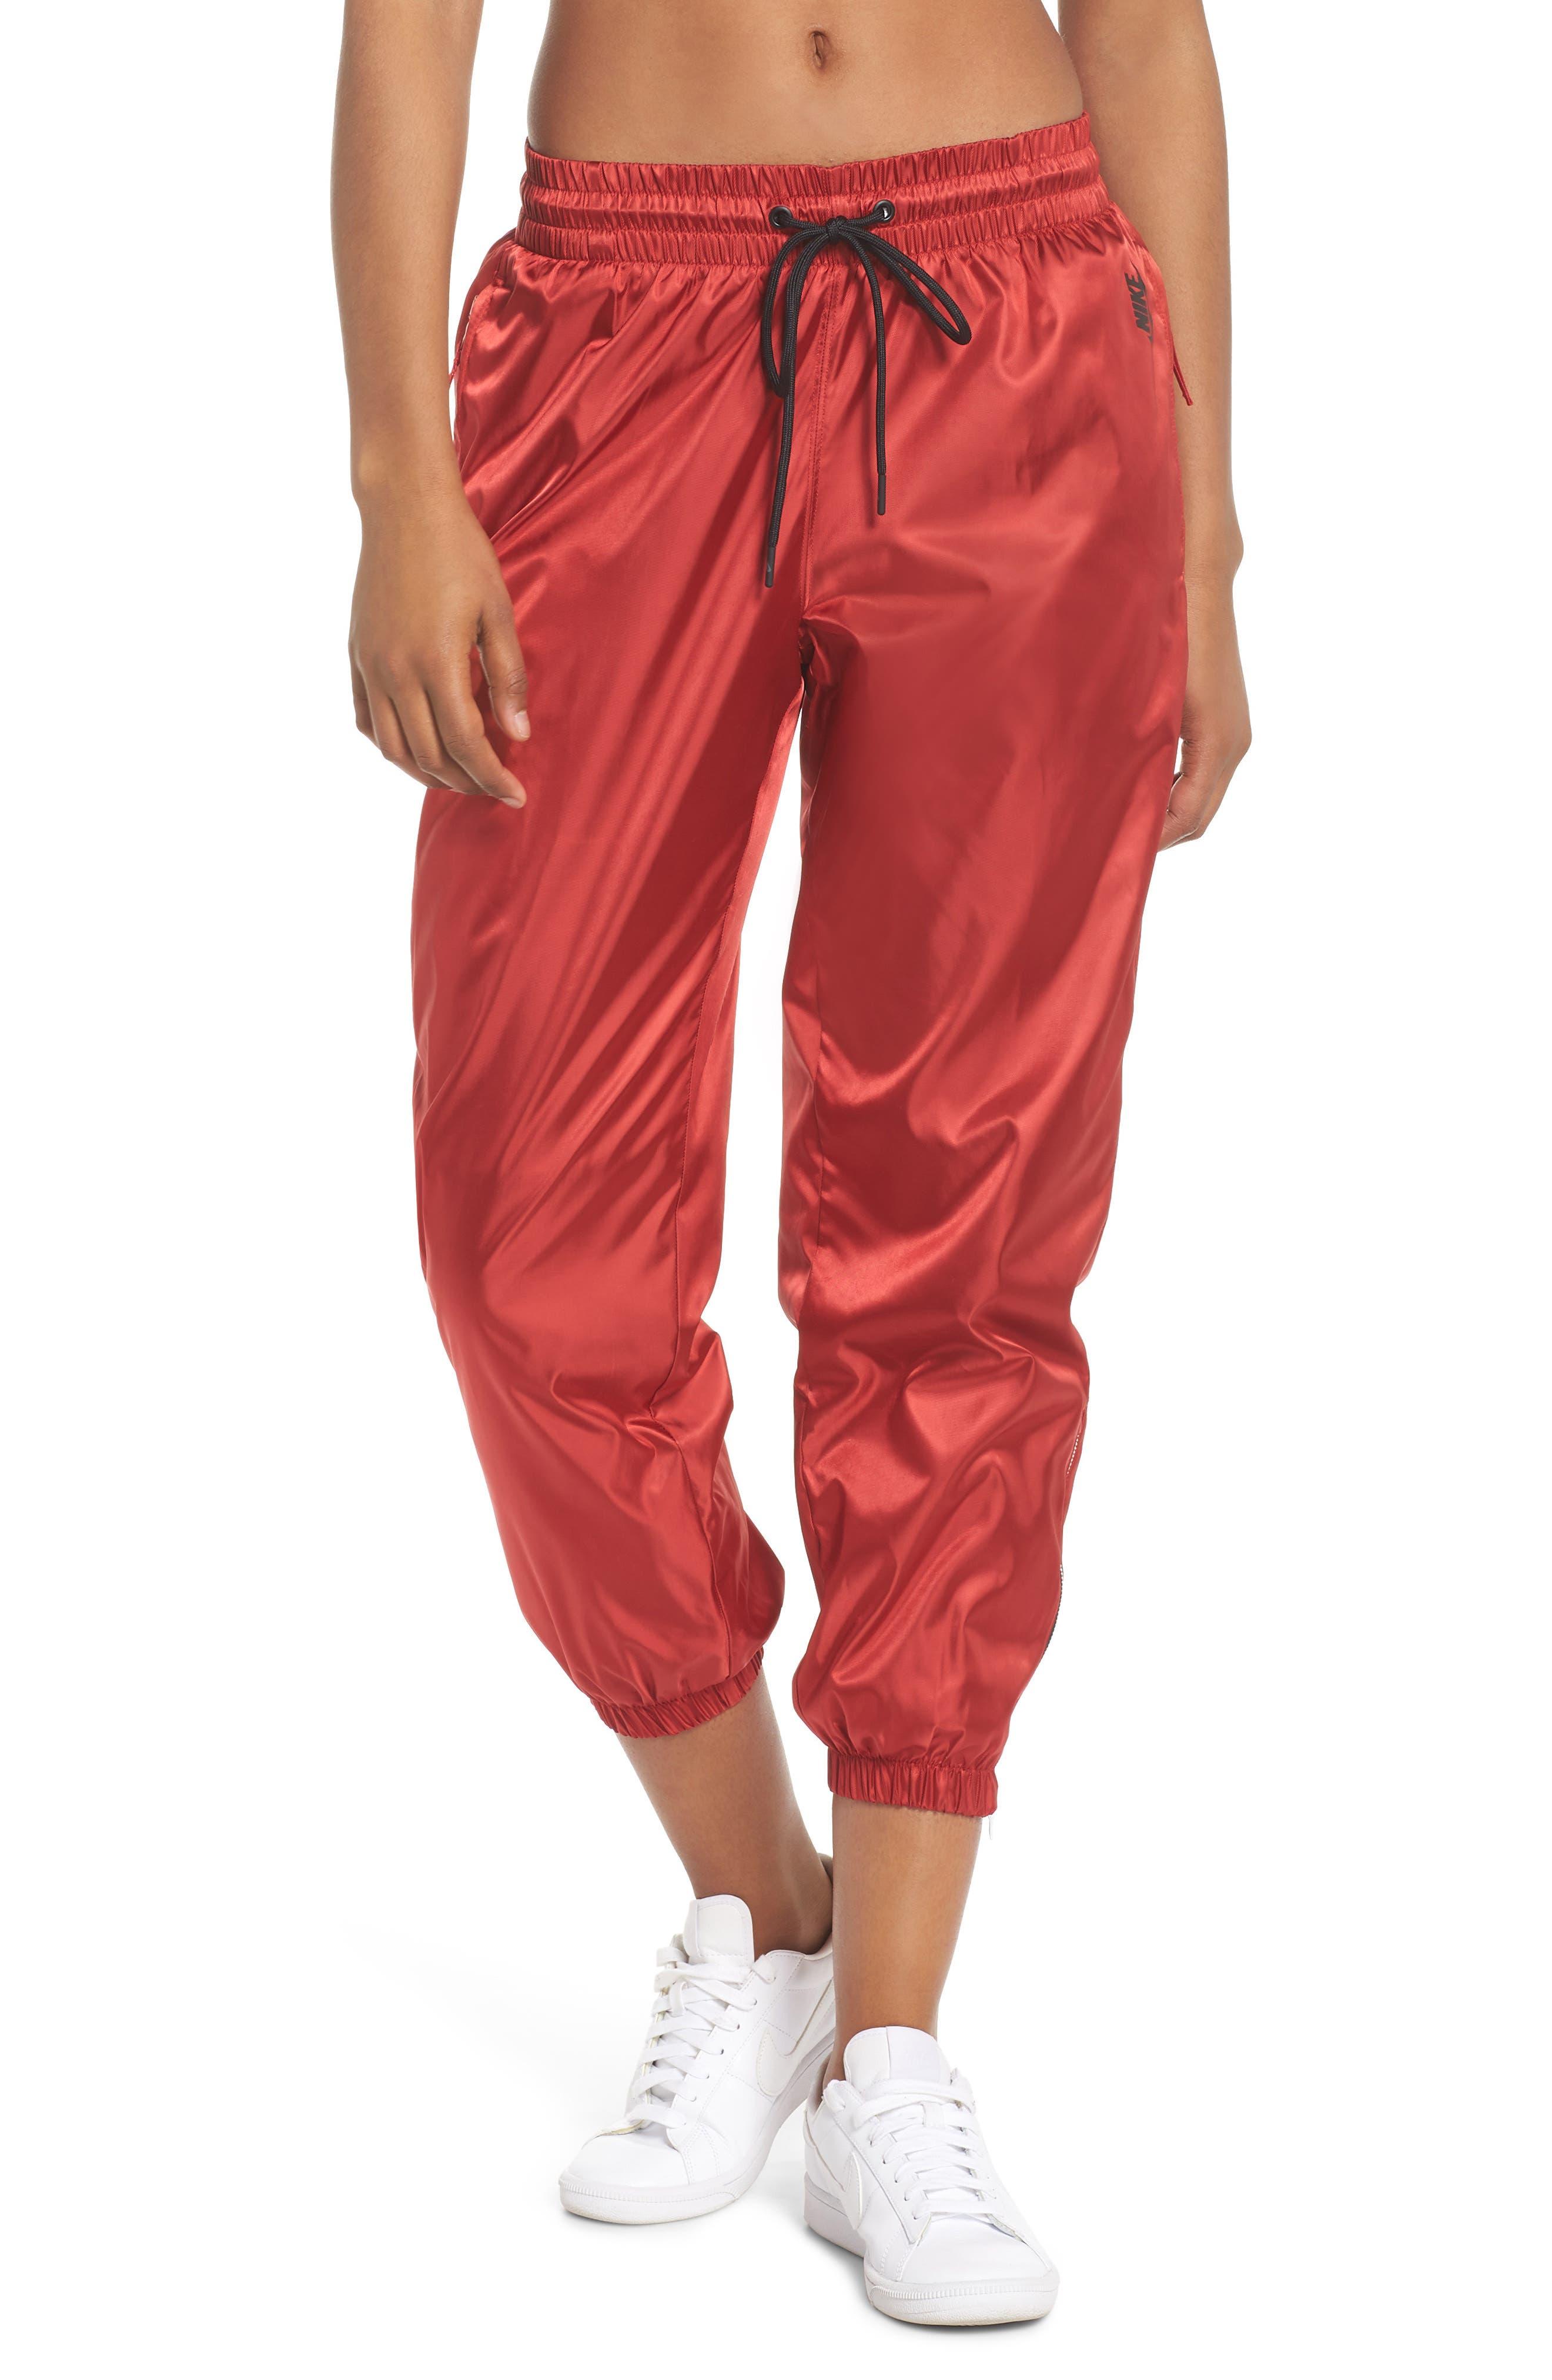 NikeLab Collection Women's Satin Track Pants,                             Main thumbnail 1, color,                             600